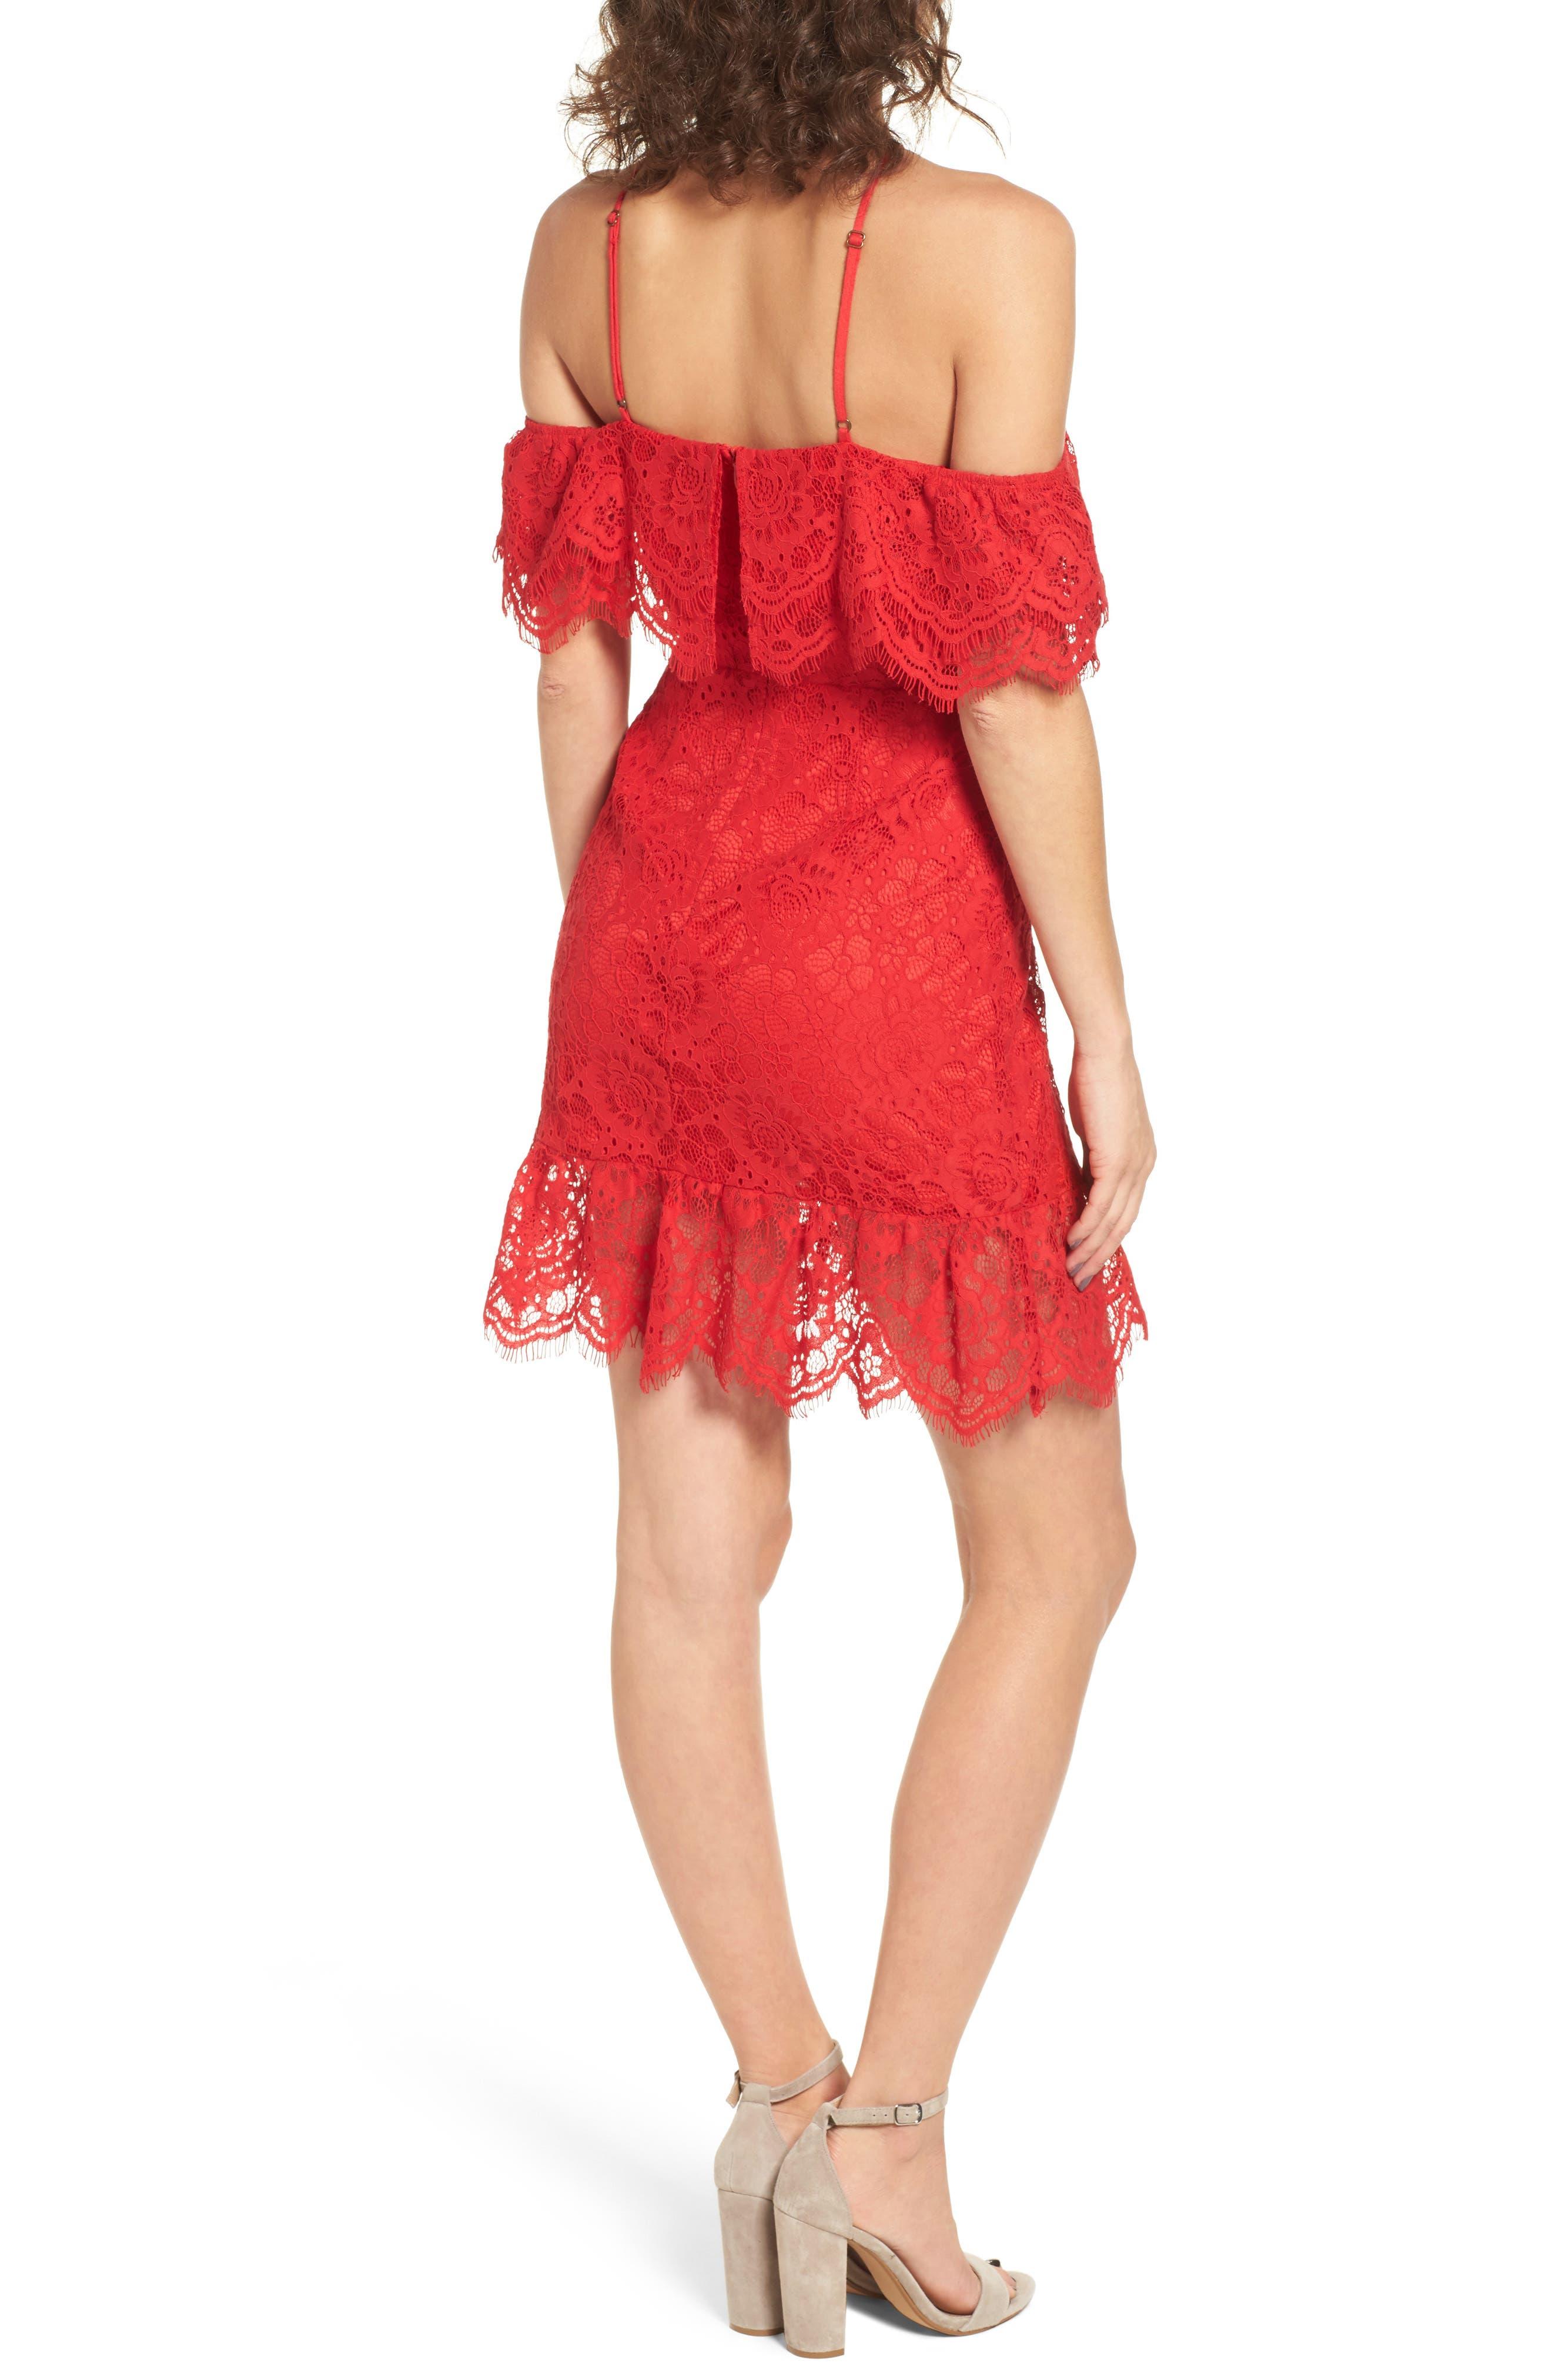 L'Amour Ruffle Halter Dress,                             Alternate thumbnail 2, color,                             600